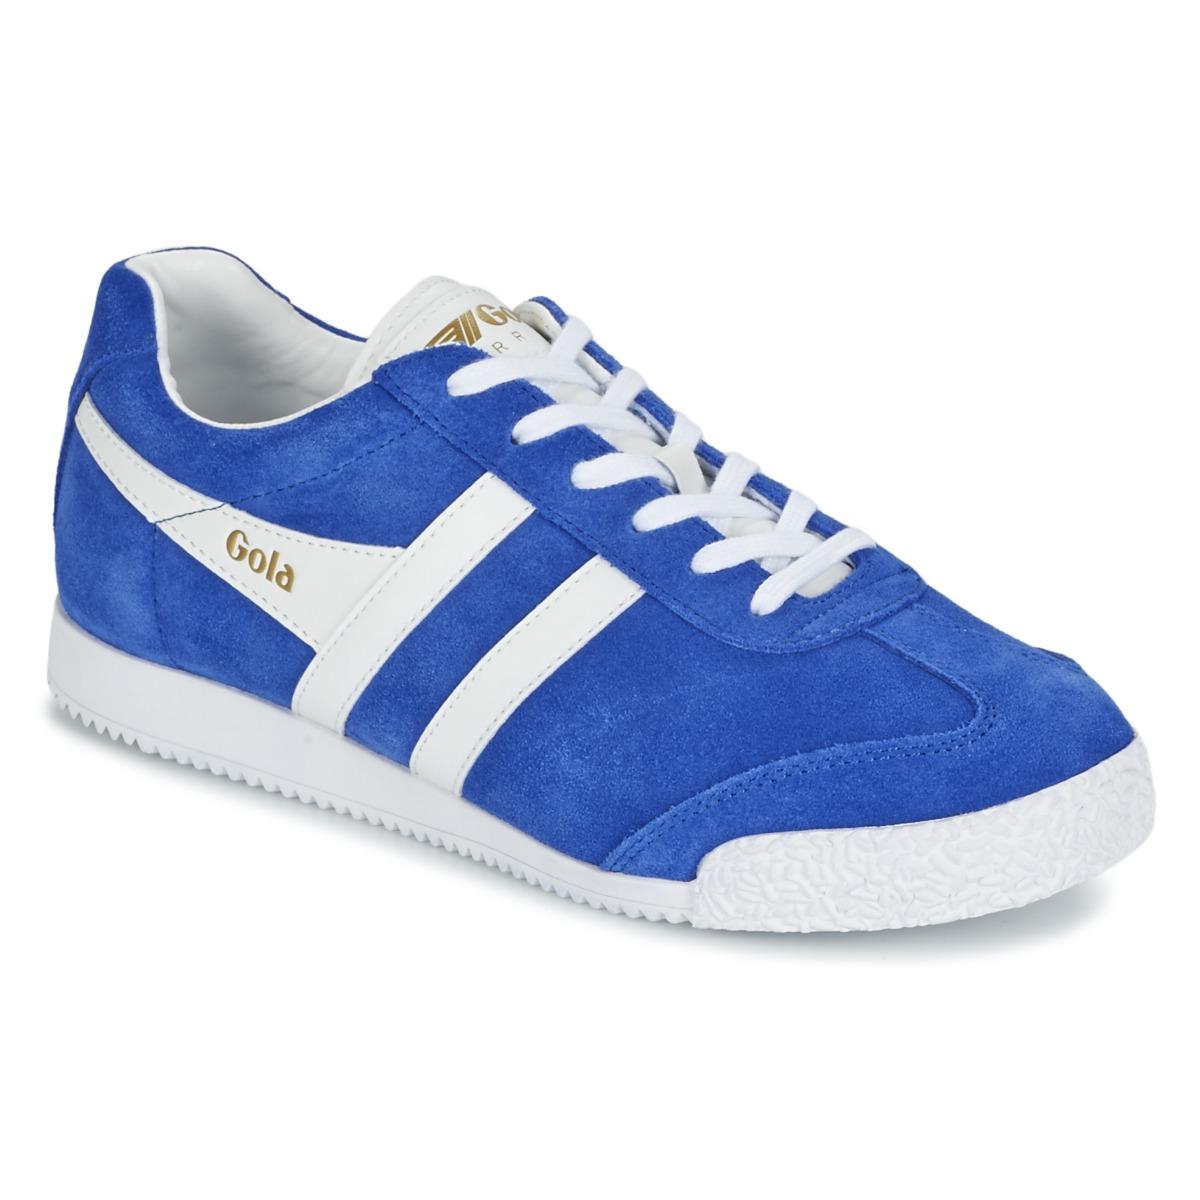 Gola HARRIER Bleu / Blanc